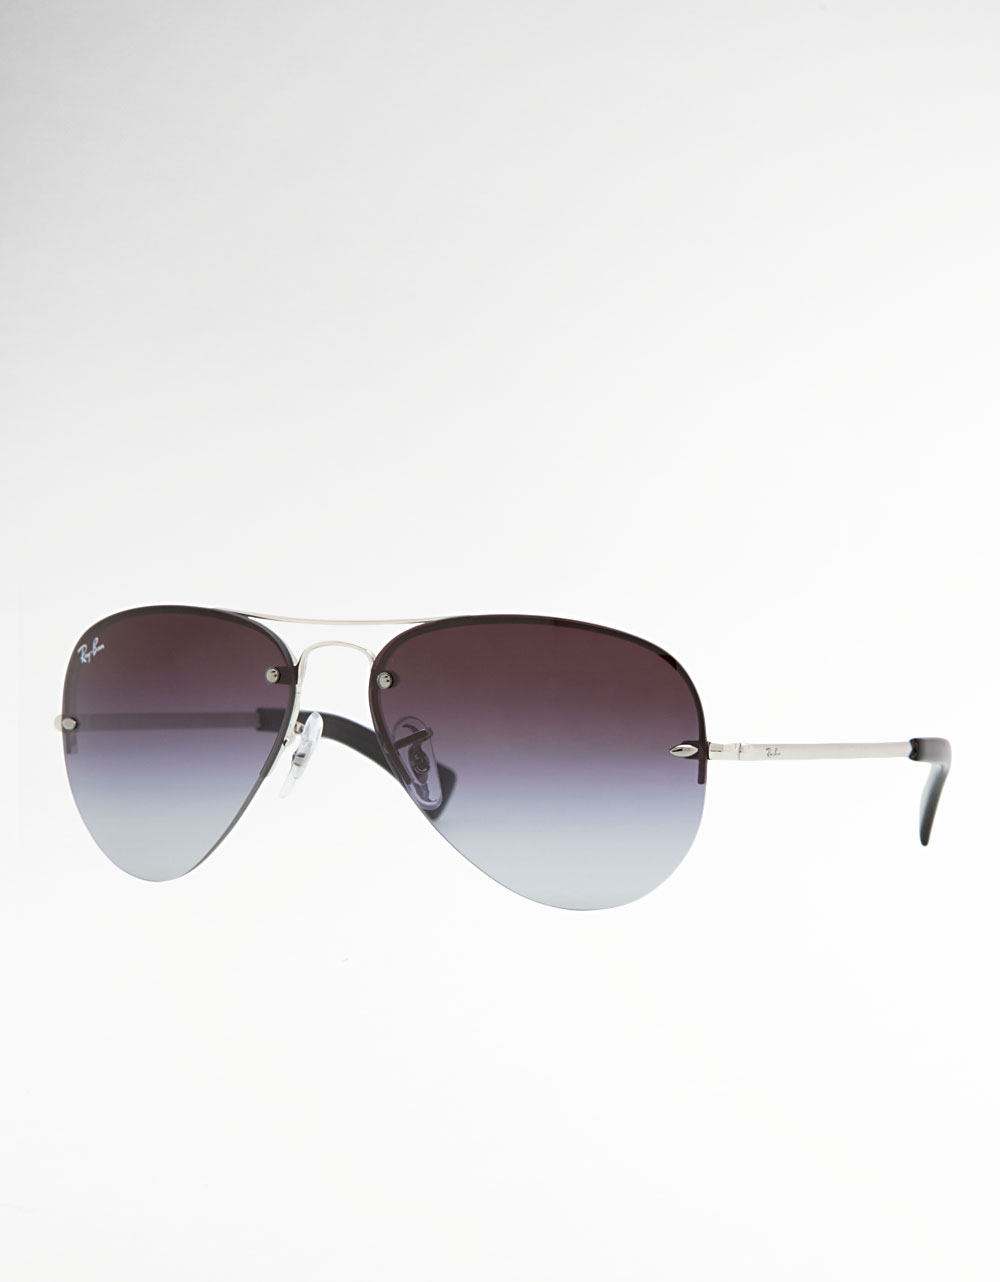 Rimless Aviator Sunglasses : Ray-ban Rimless Aviator Sunglasses in Gray (grad smoke) Lyst